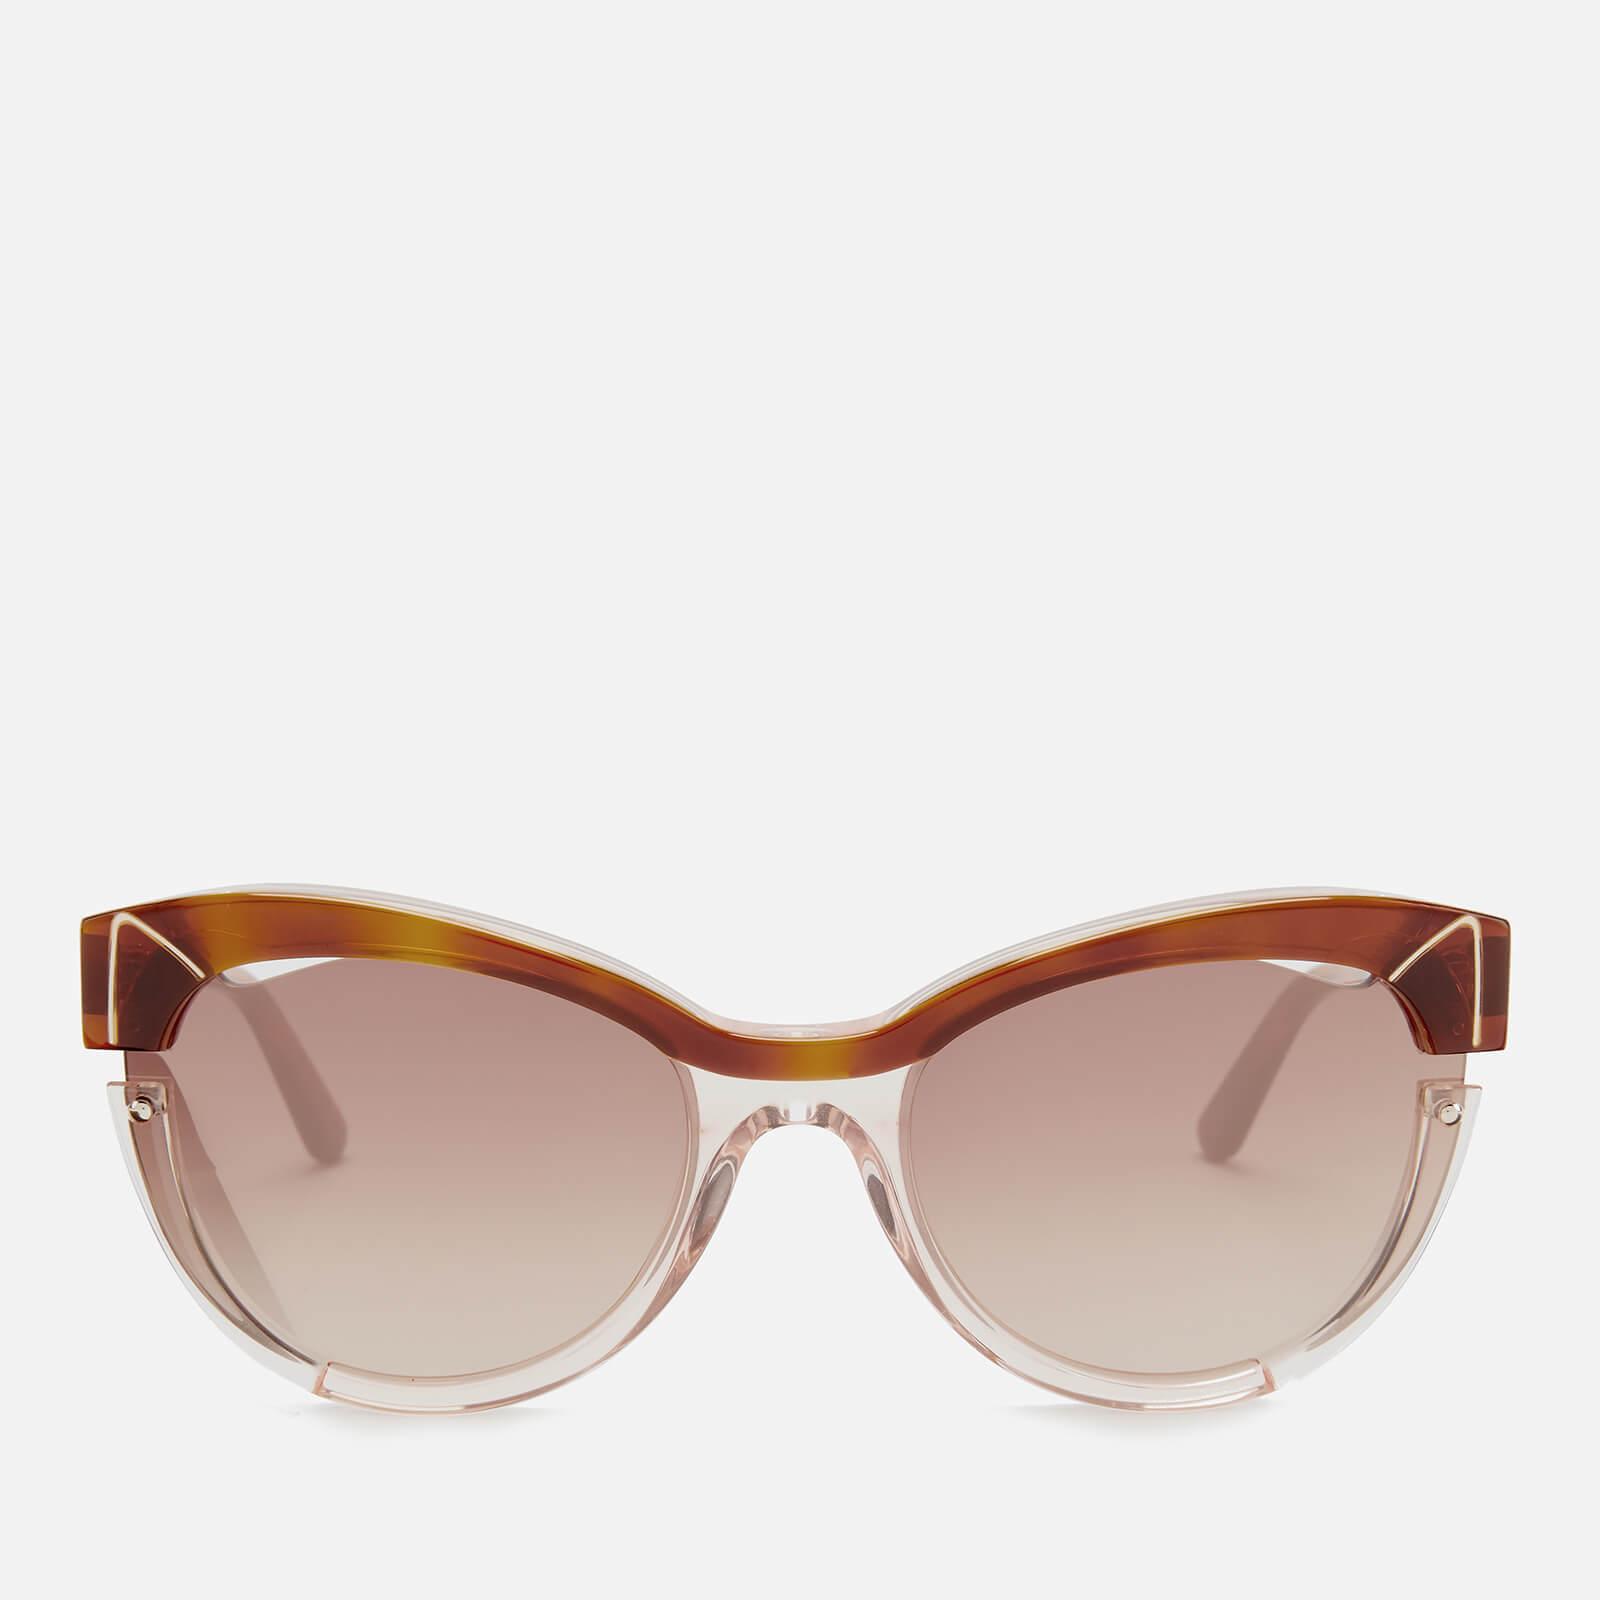 Karl Lagerfeld Women's Cat Eye Frame Sunglasses - Blonde Havana/Pink